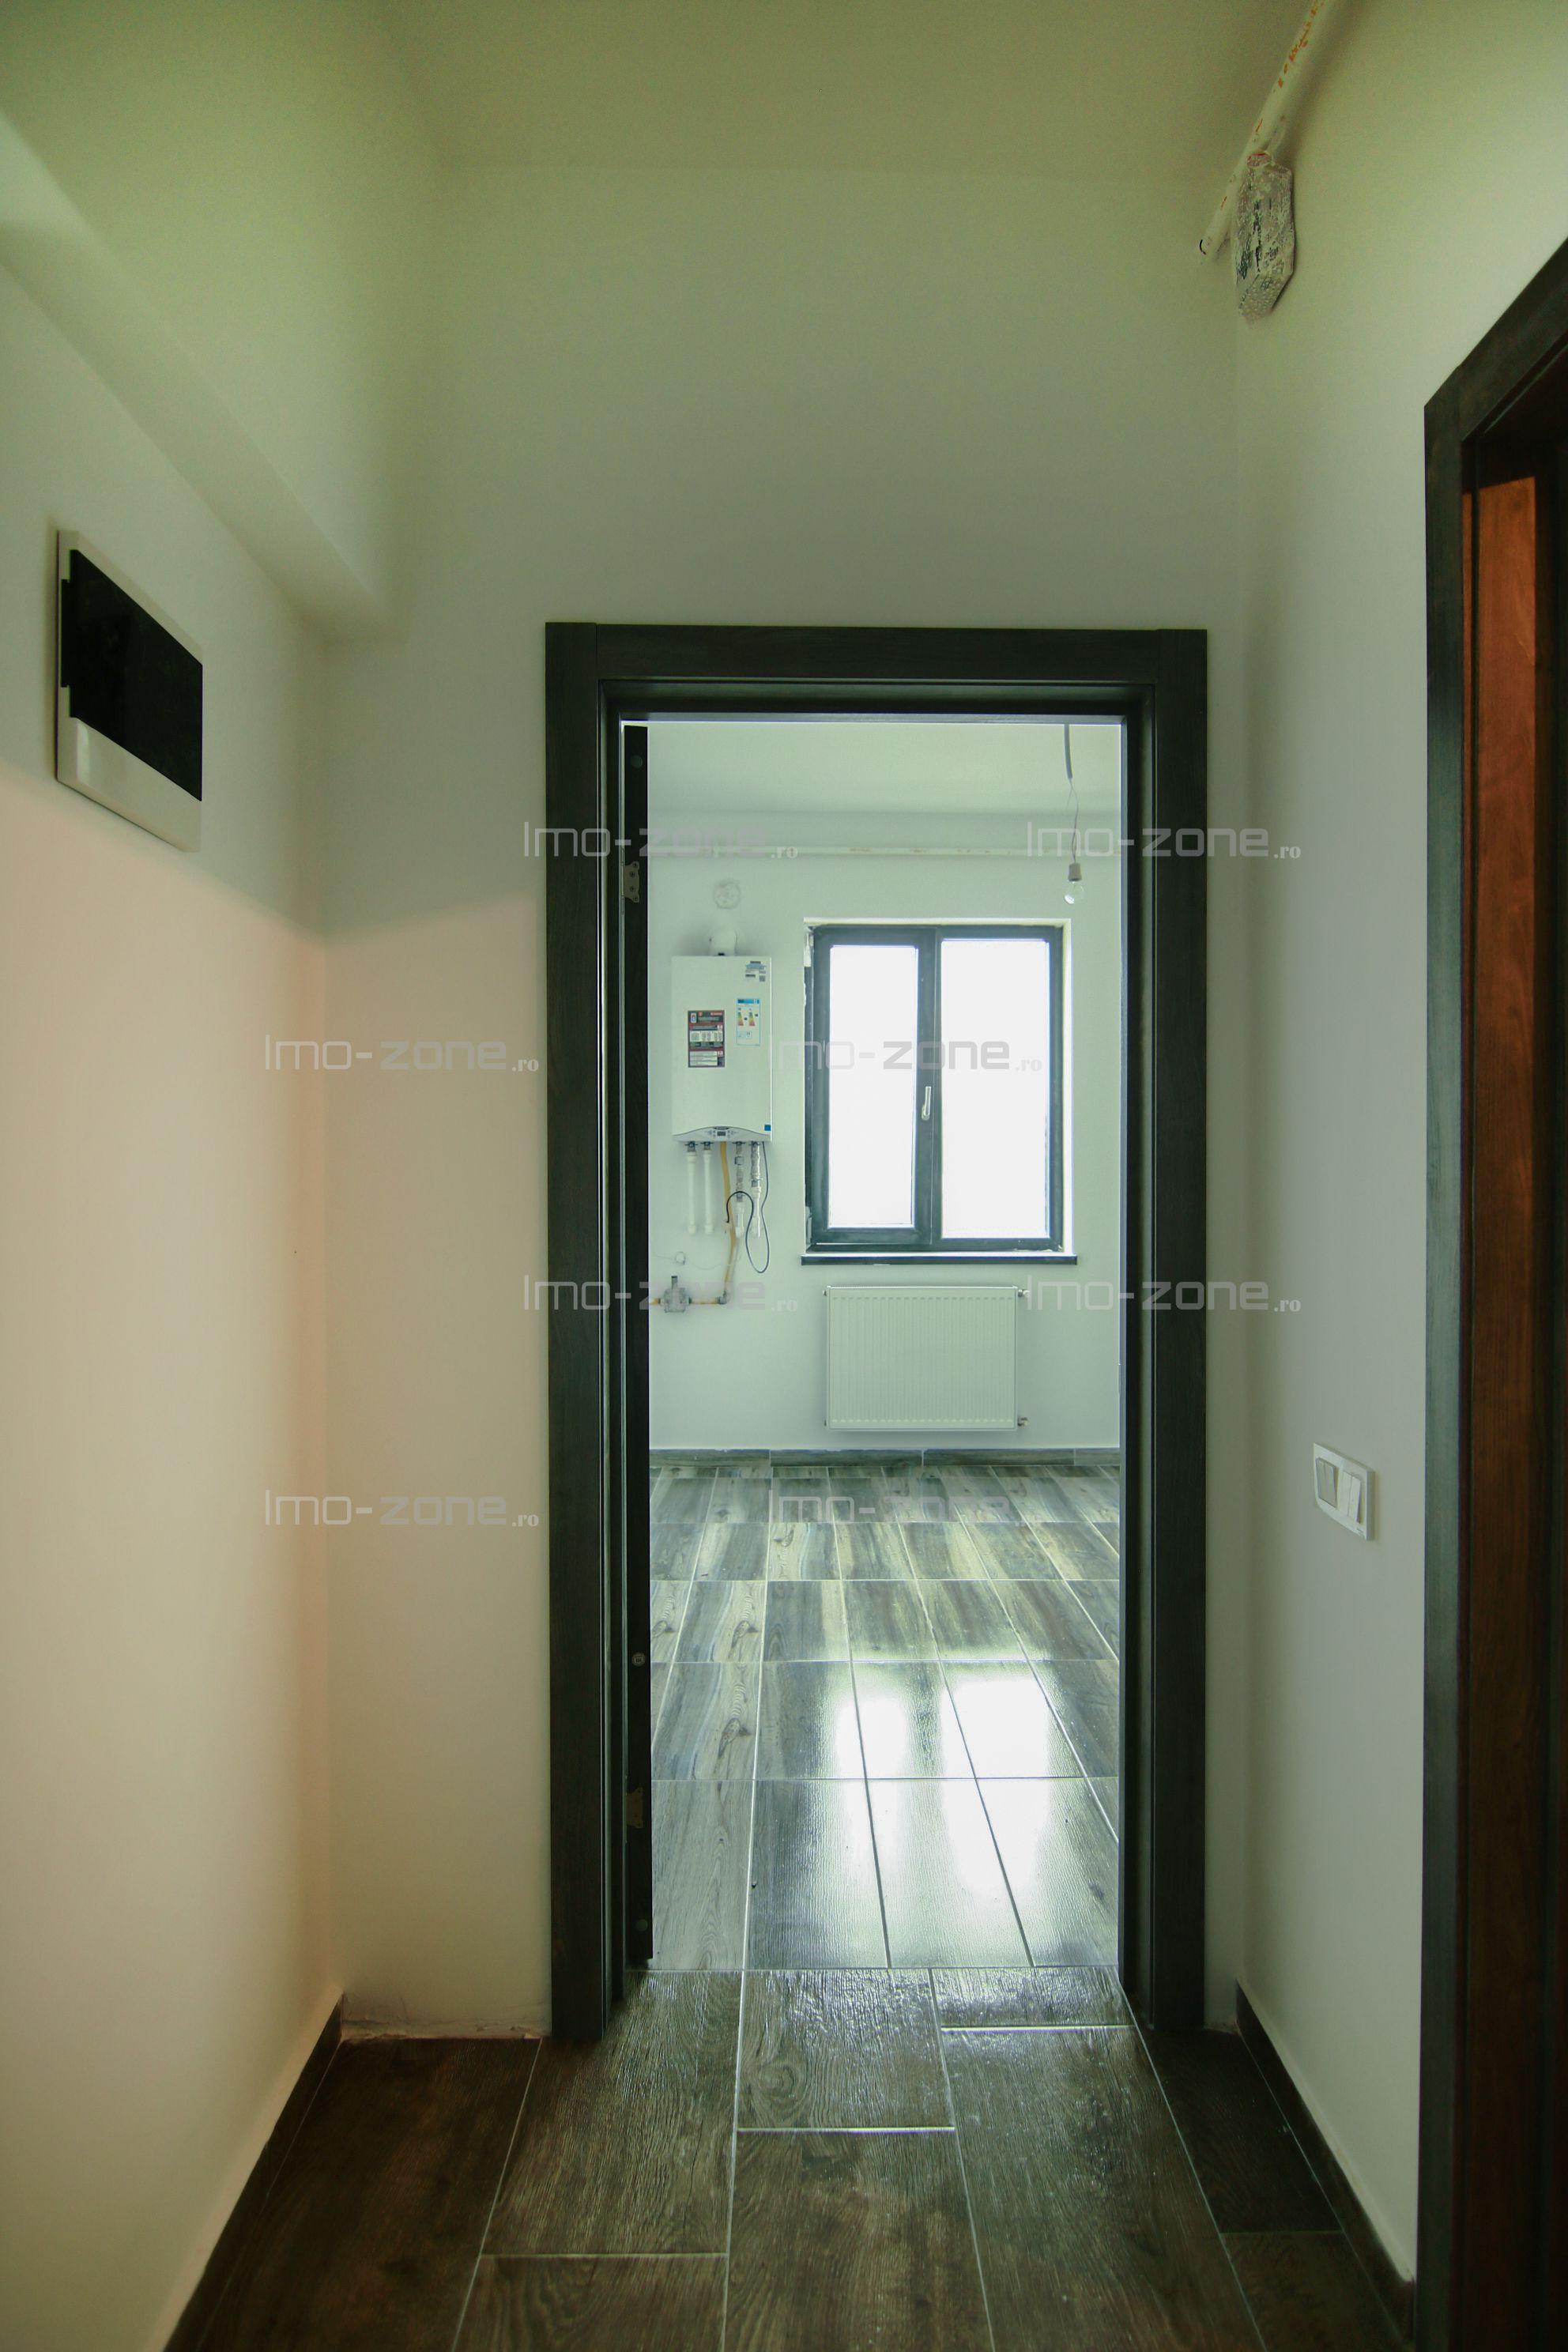 MILITARI - PACII, etaj 7/9, 61 mp, 2 camere, la 5 minute de metrou Pacii